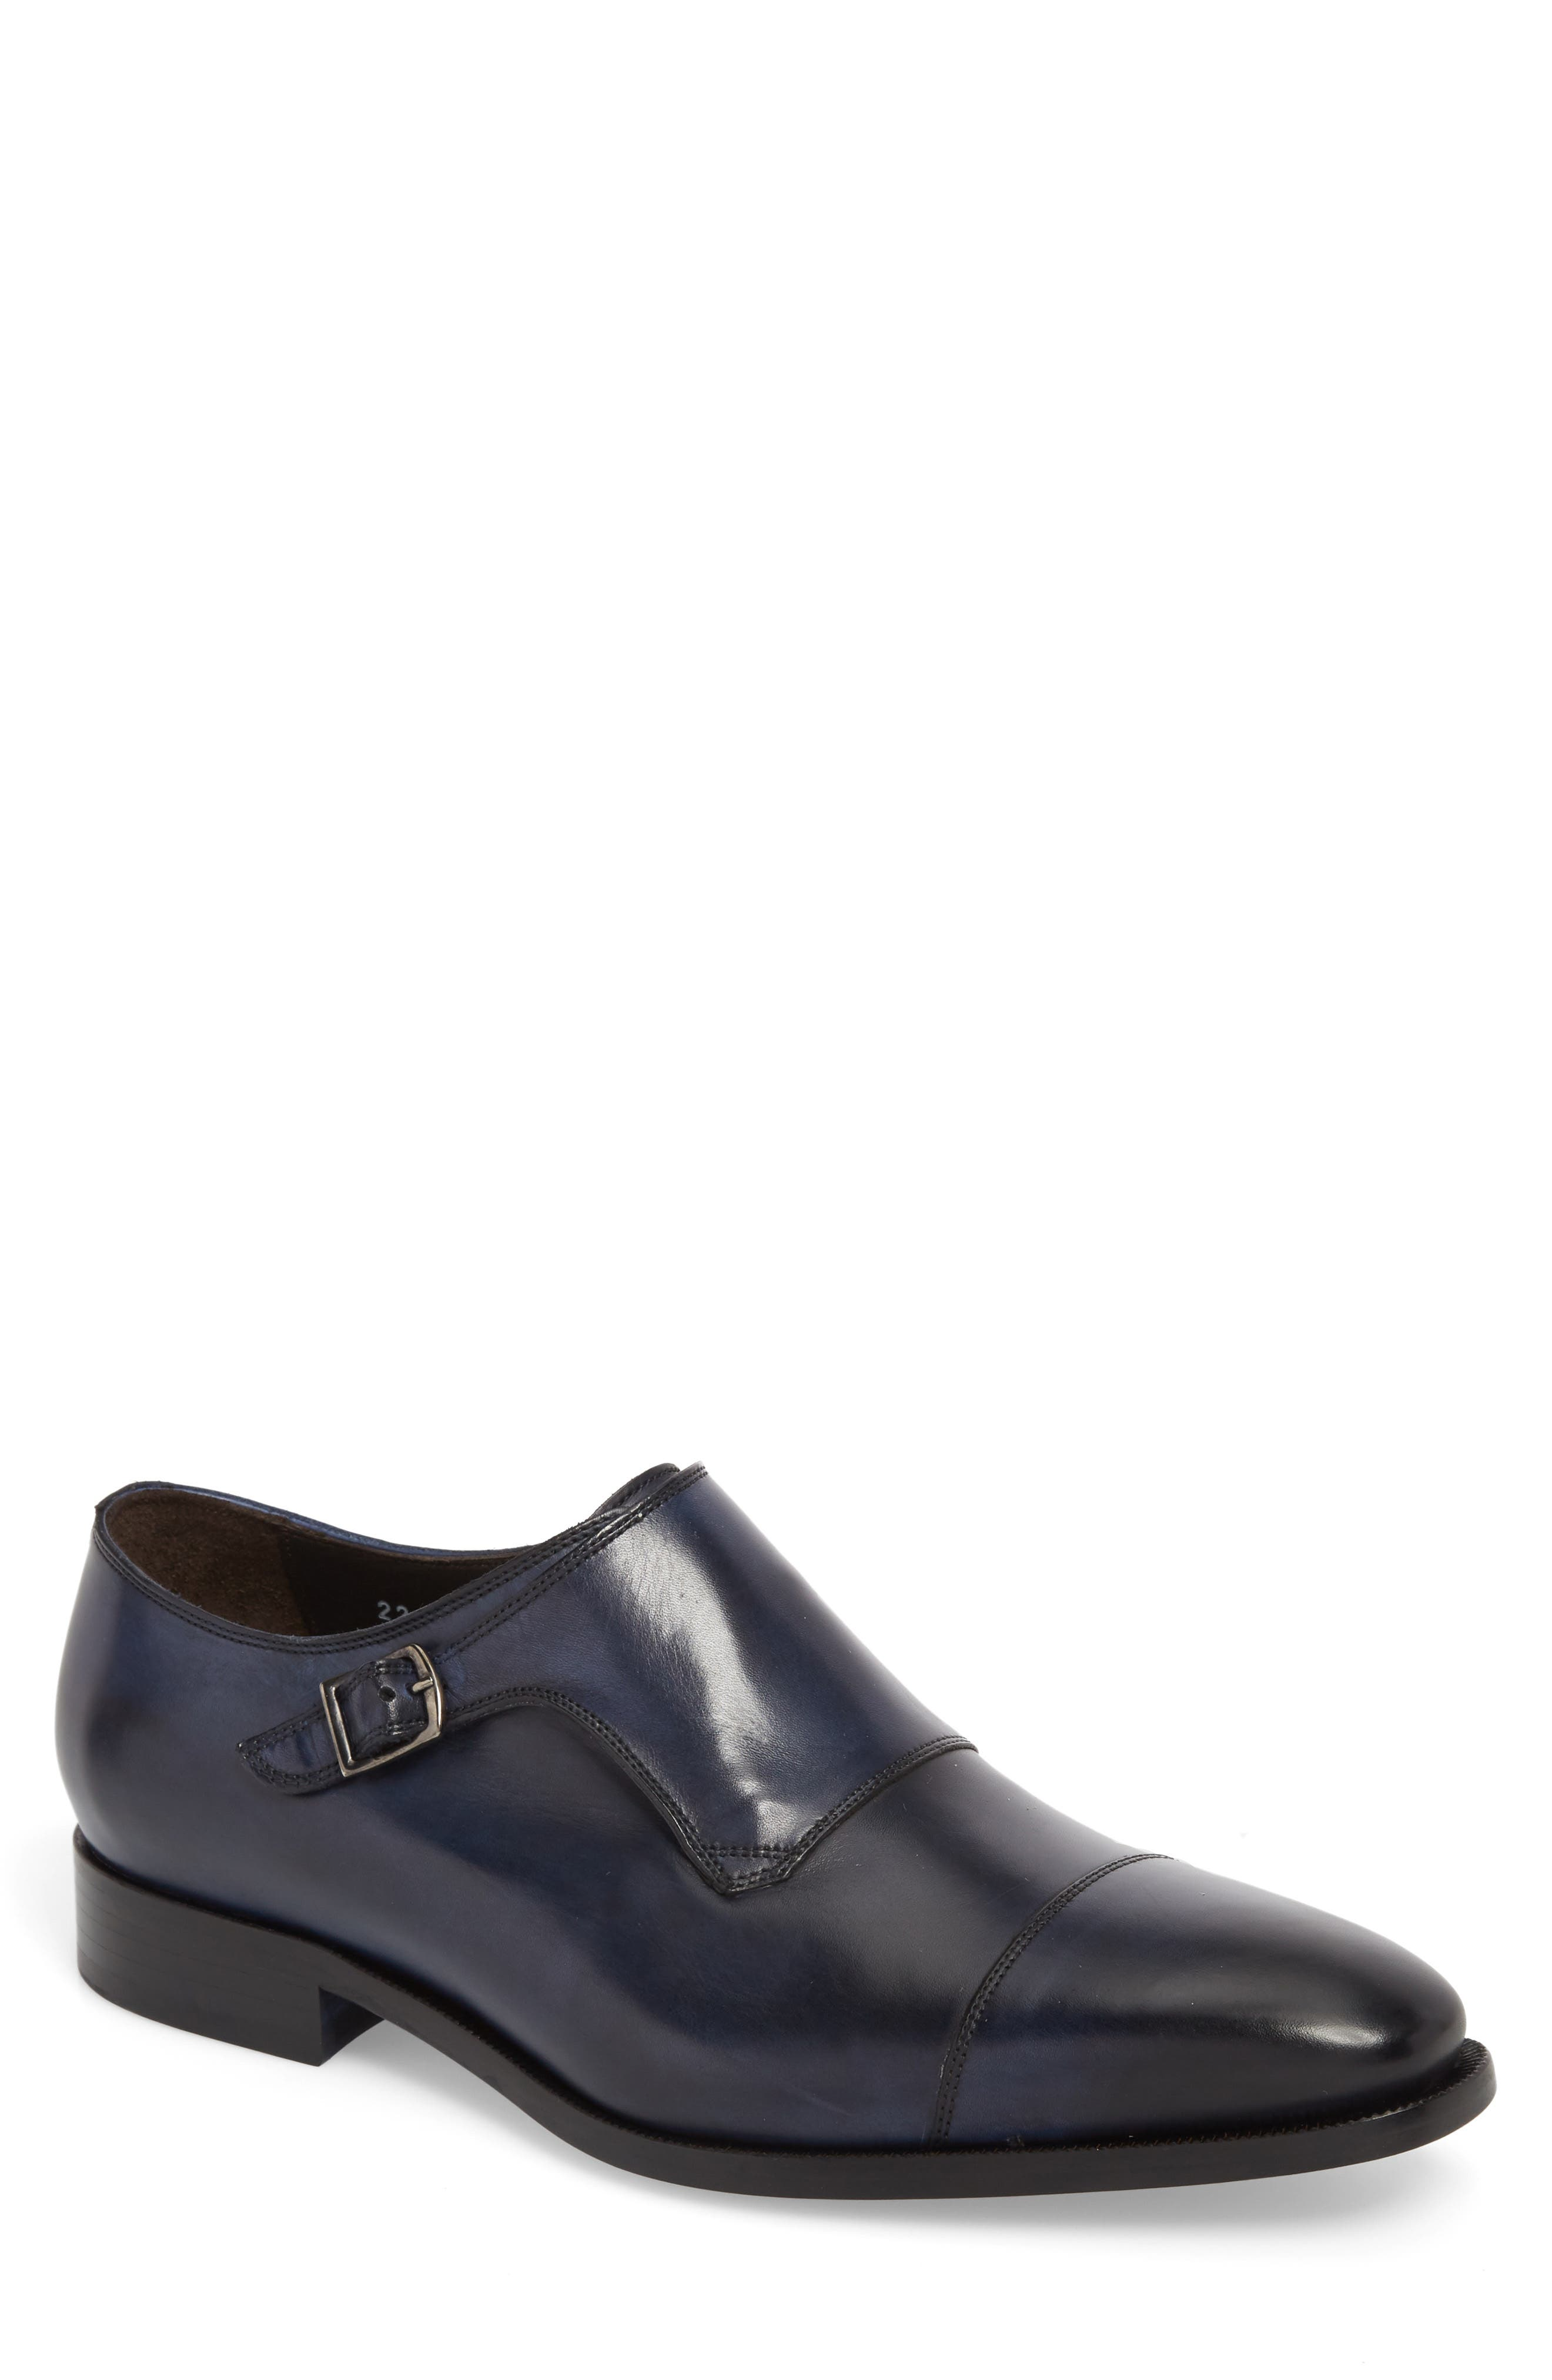 Ludlum Cap Toe Monk Shoe,                             Main thumbnail 1, color,                             Blue Leather